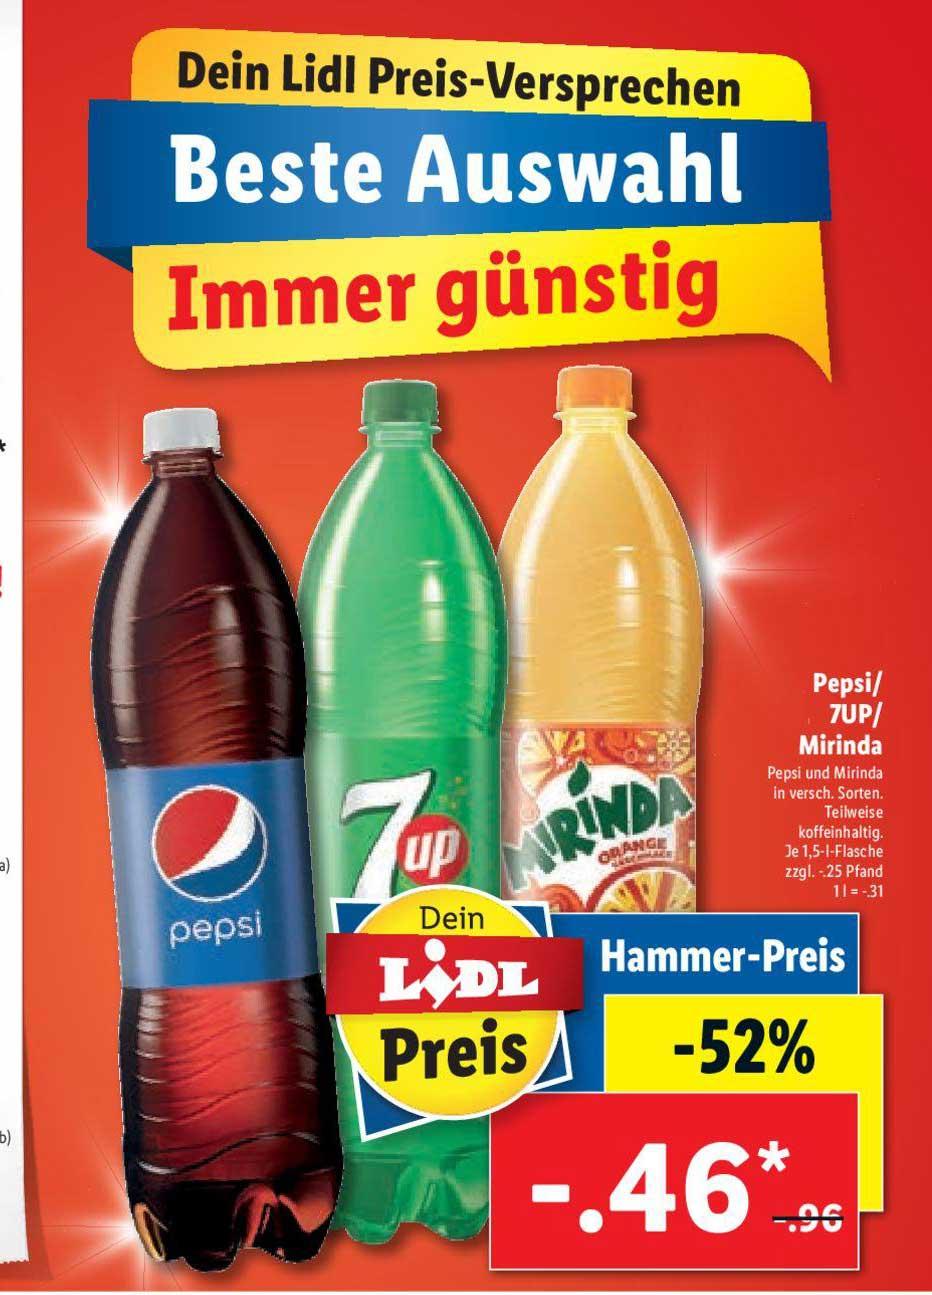 Lidl Pepsi- 7up - Mirinda